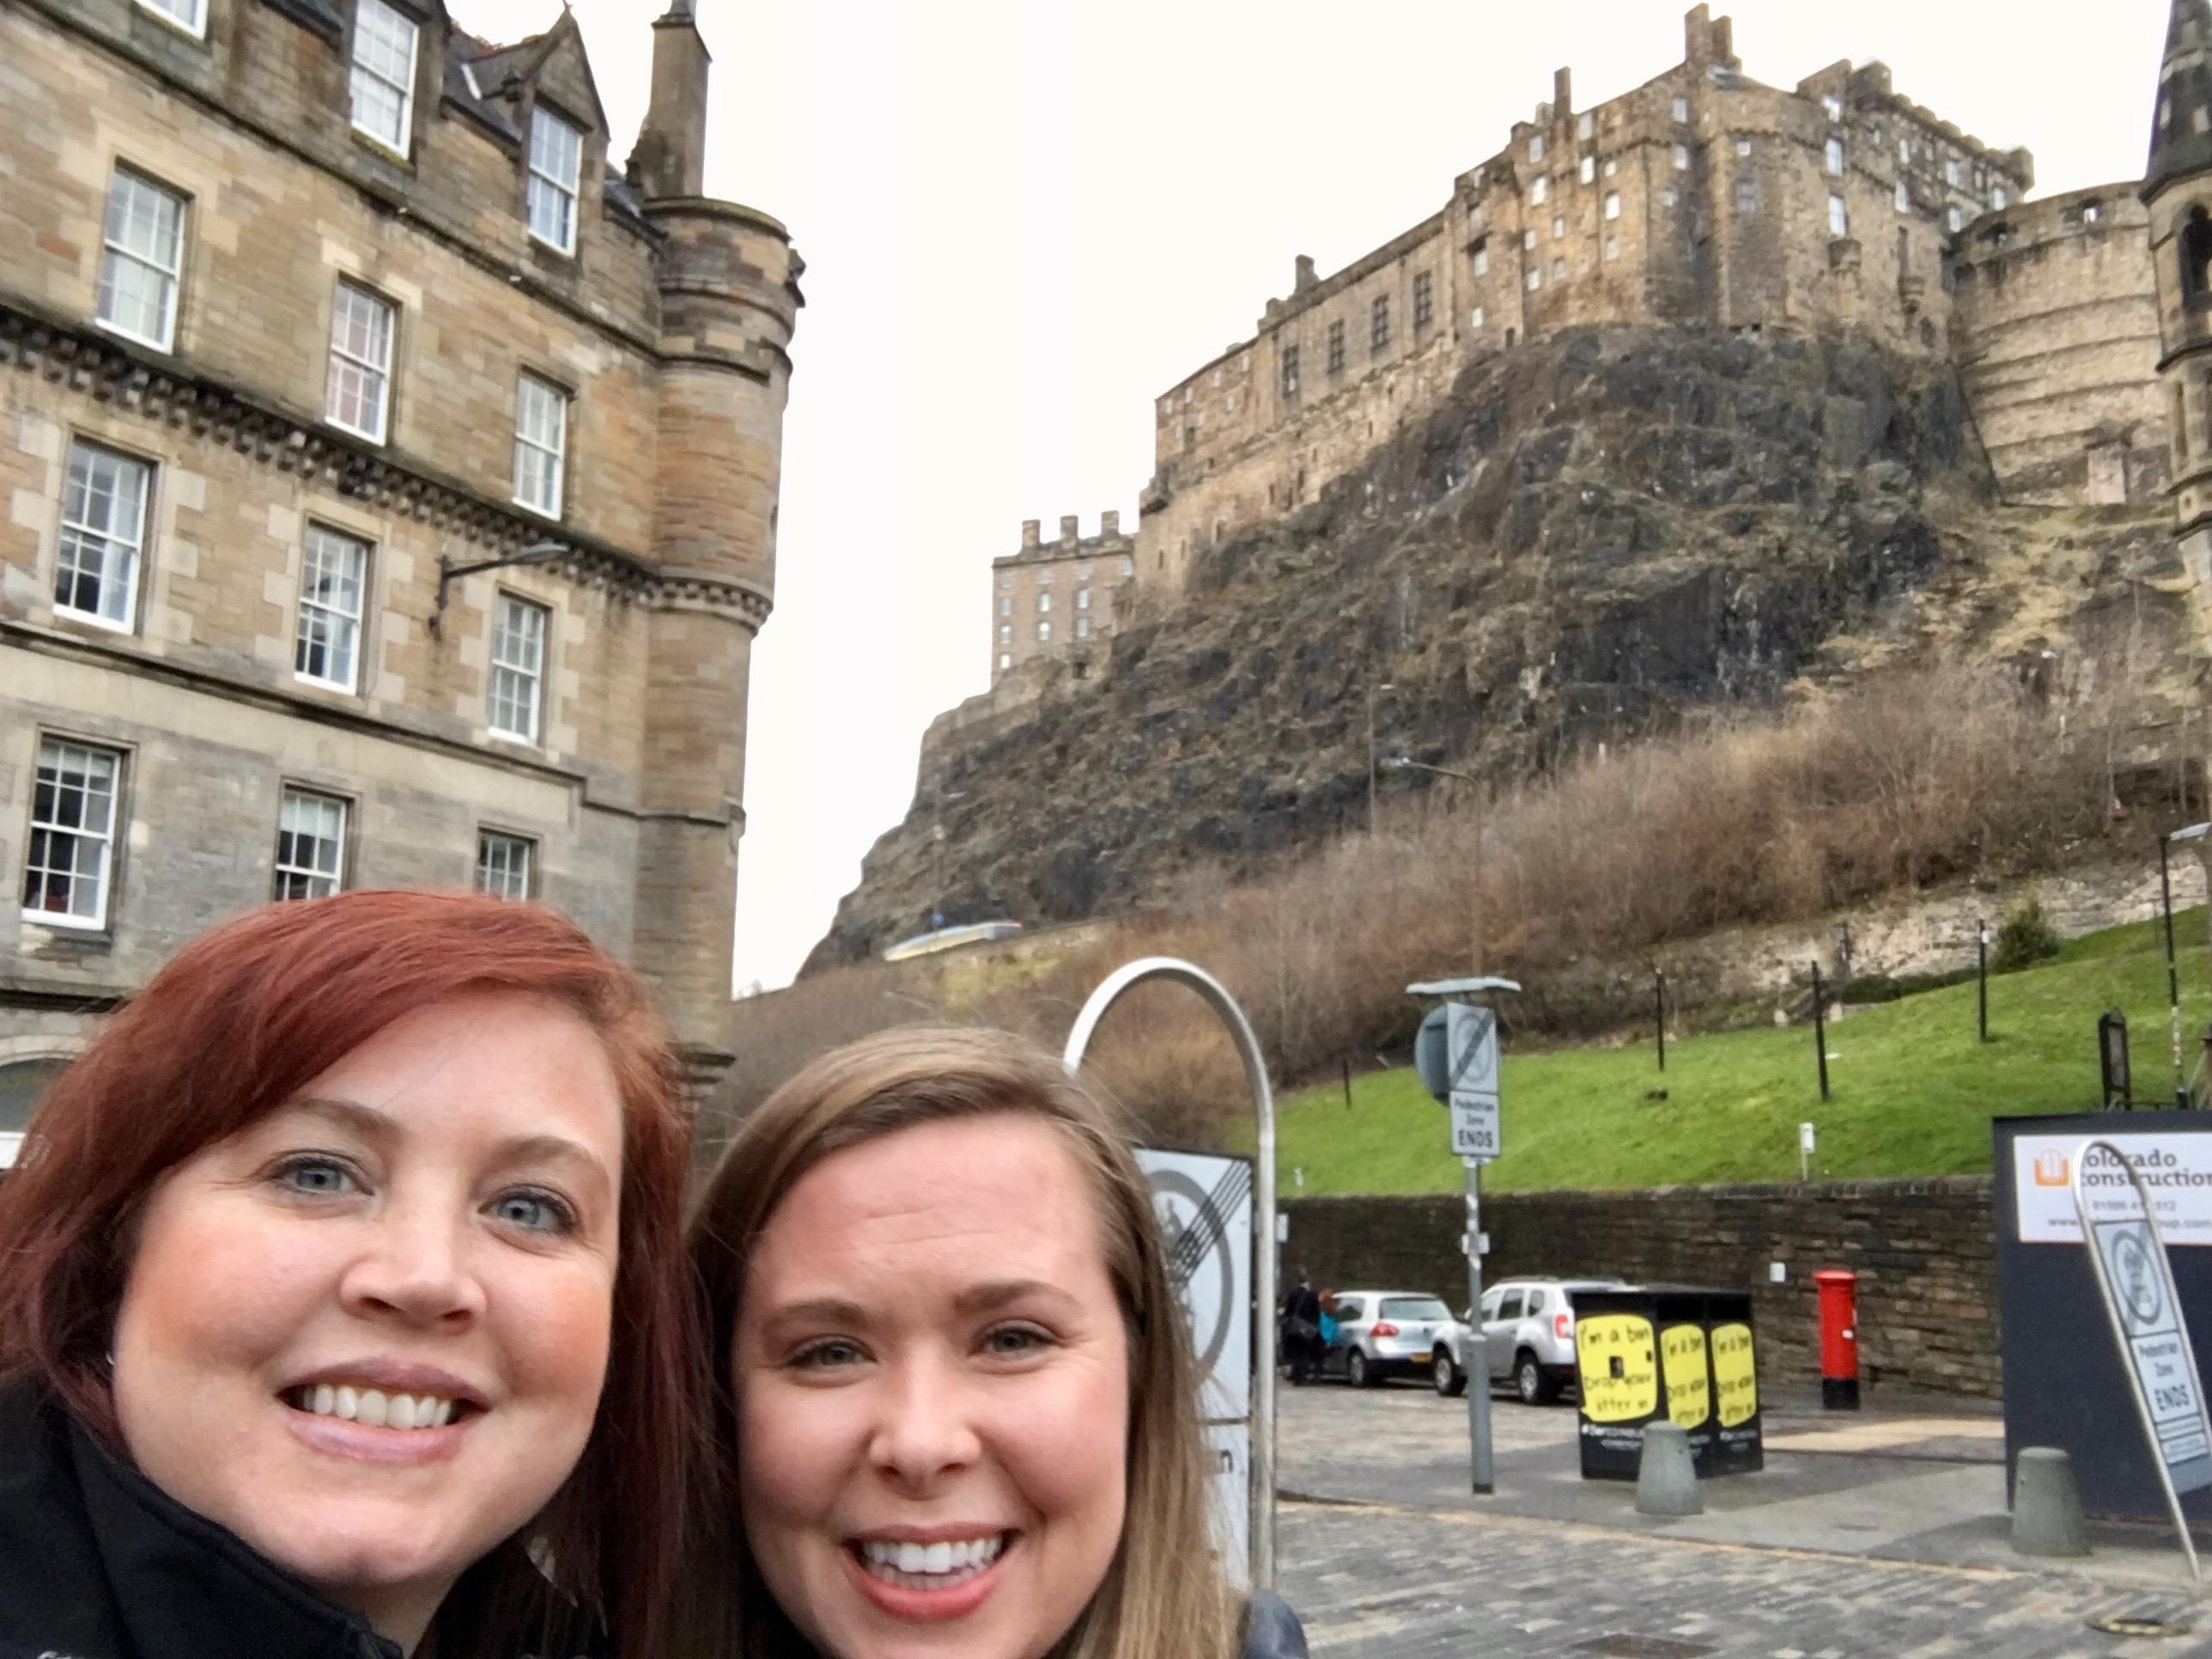 Edinburgh Castle in the background (inspired Hogwarts)